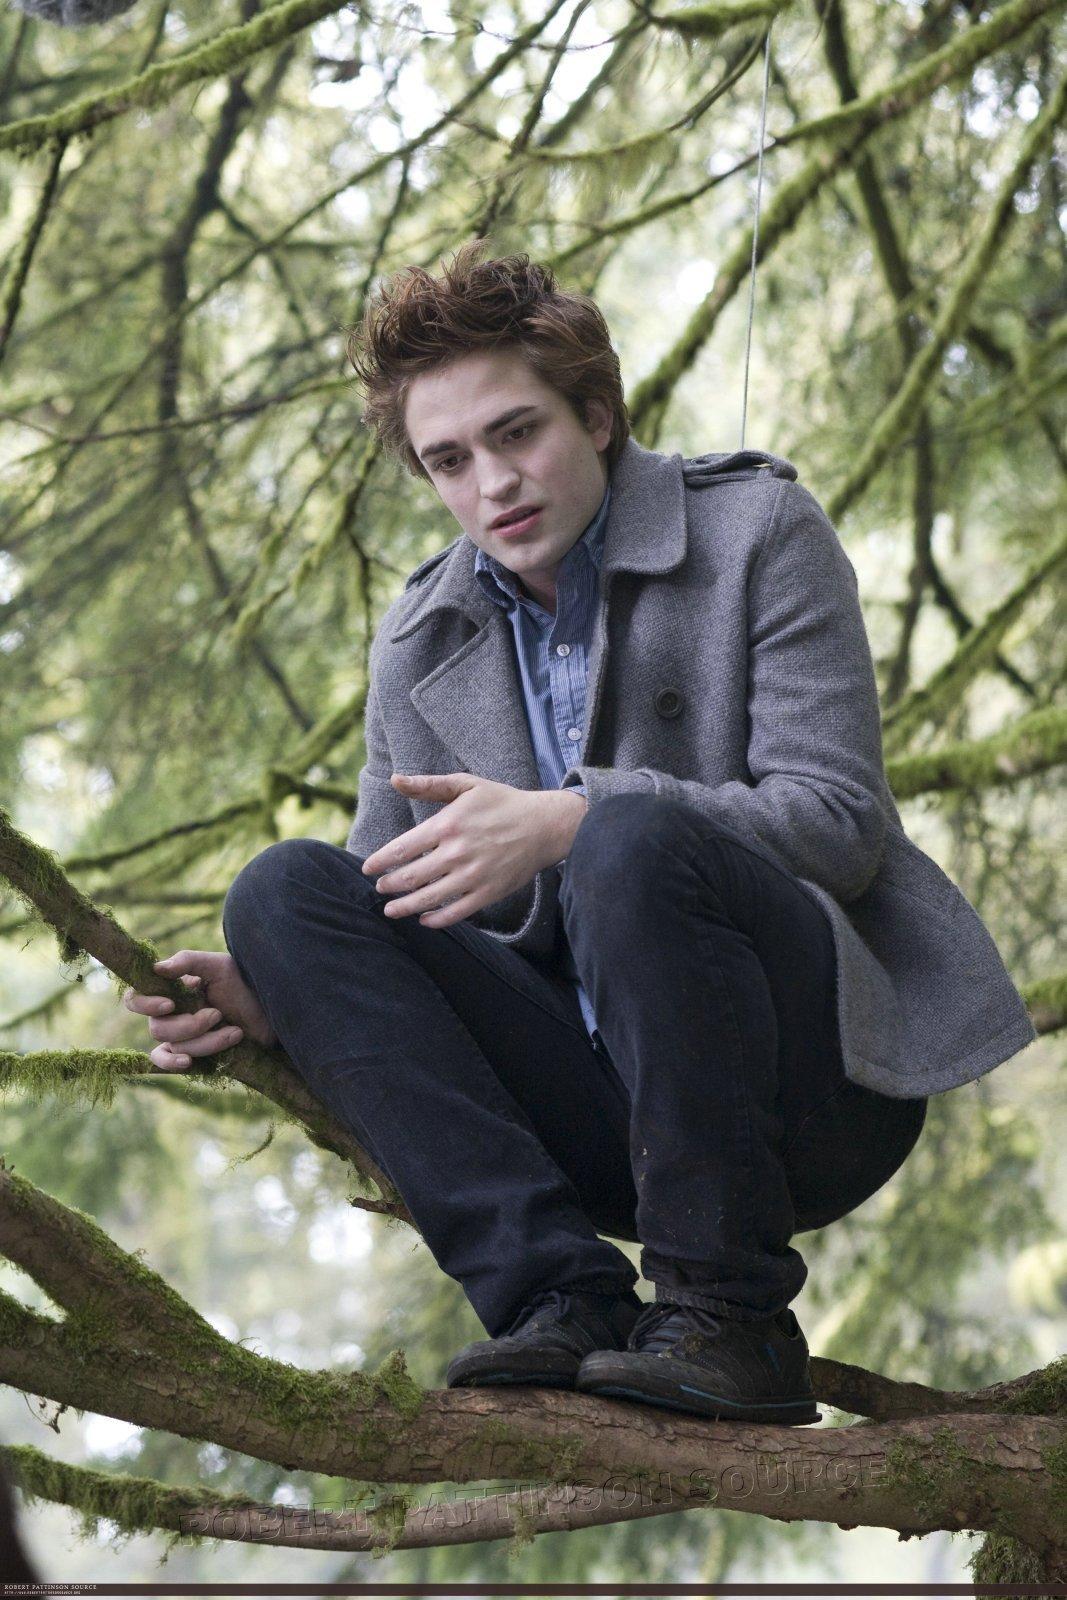 Edward Cullen Team Twilight Photo 5230165 Fanpop